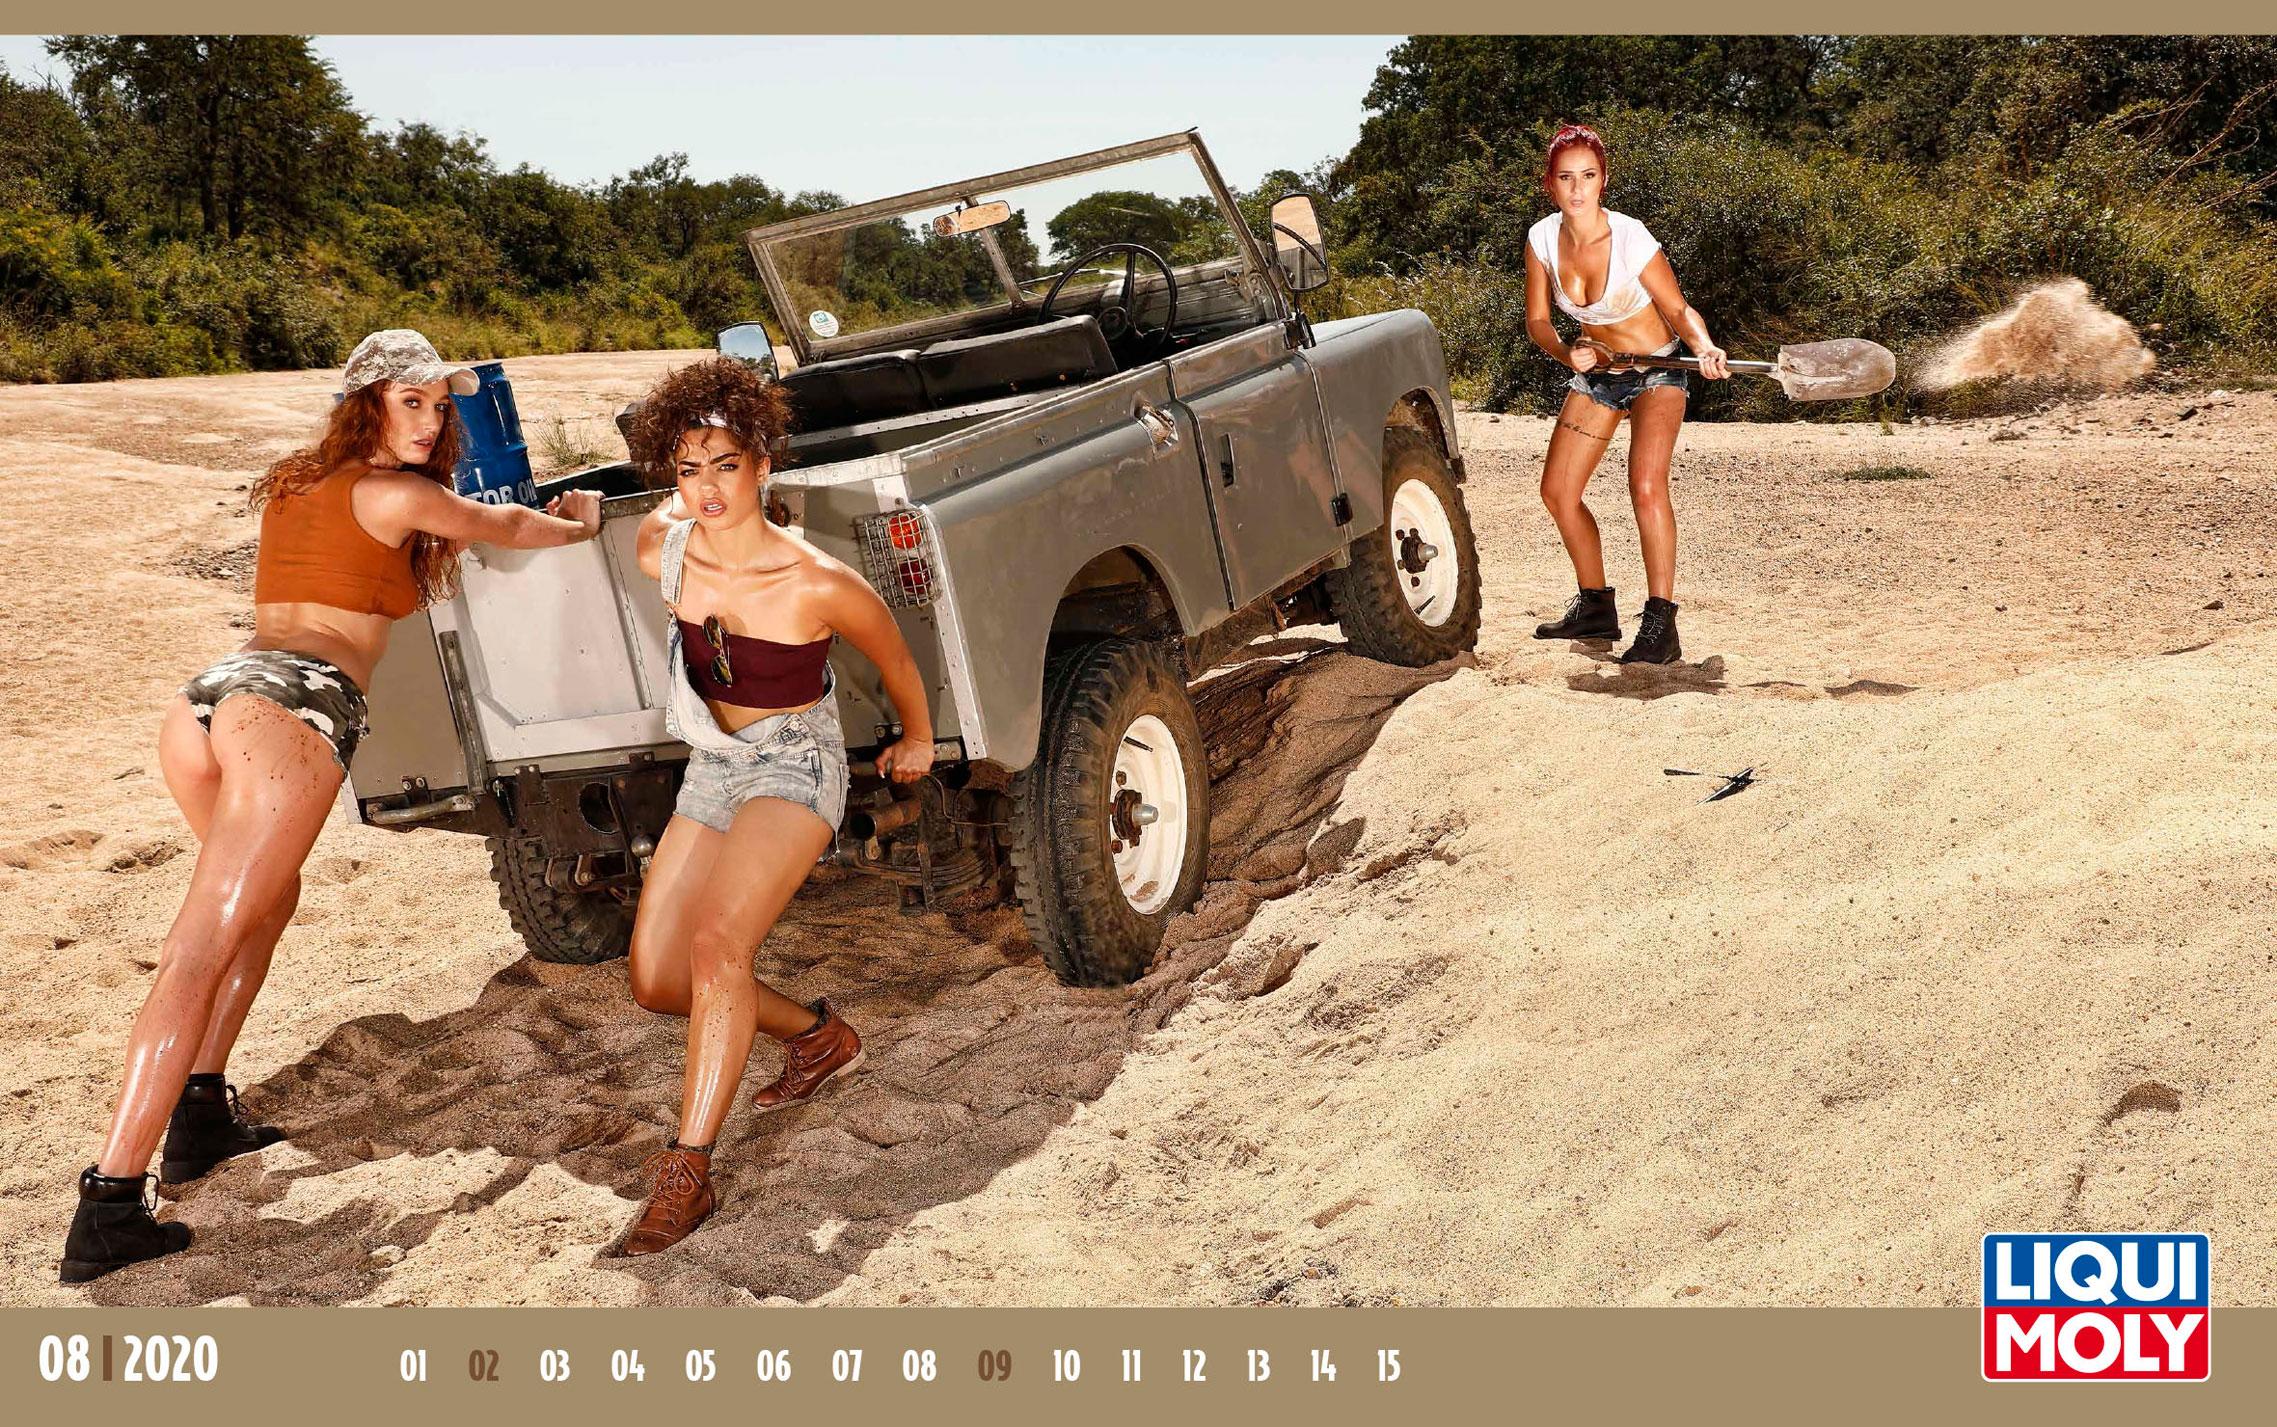 Календарь с девушками автоконцерна Liqui Moly, 2020 год / август-1